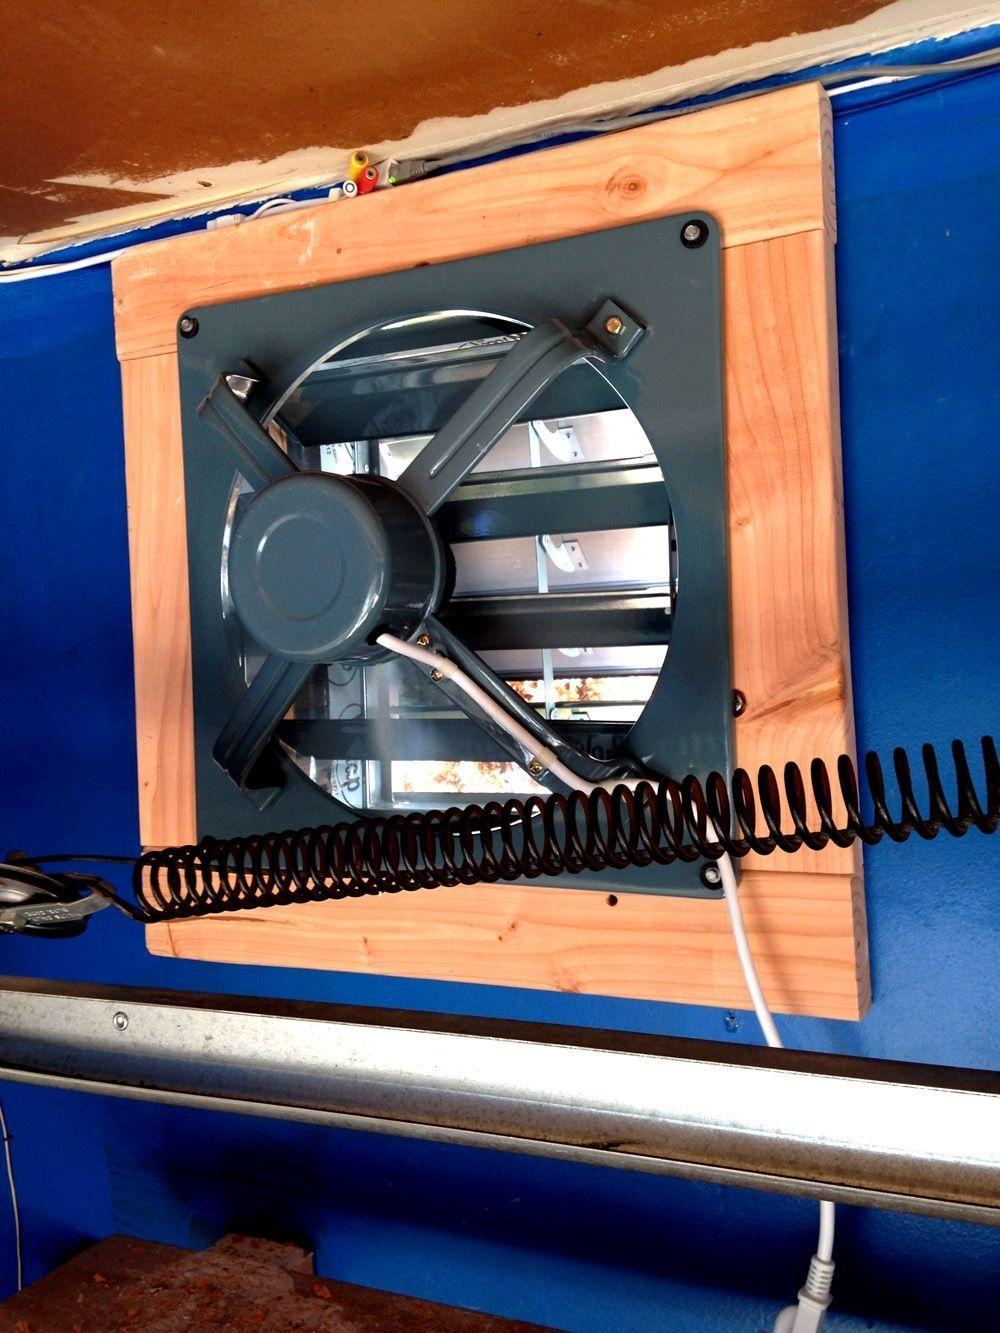 How To Install An Exhaust Fan Easy Diy Garage Ventilation System Tutorial Garage Ventilation Exhaust Fan Diy Garage